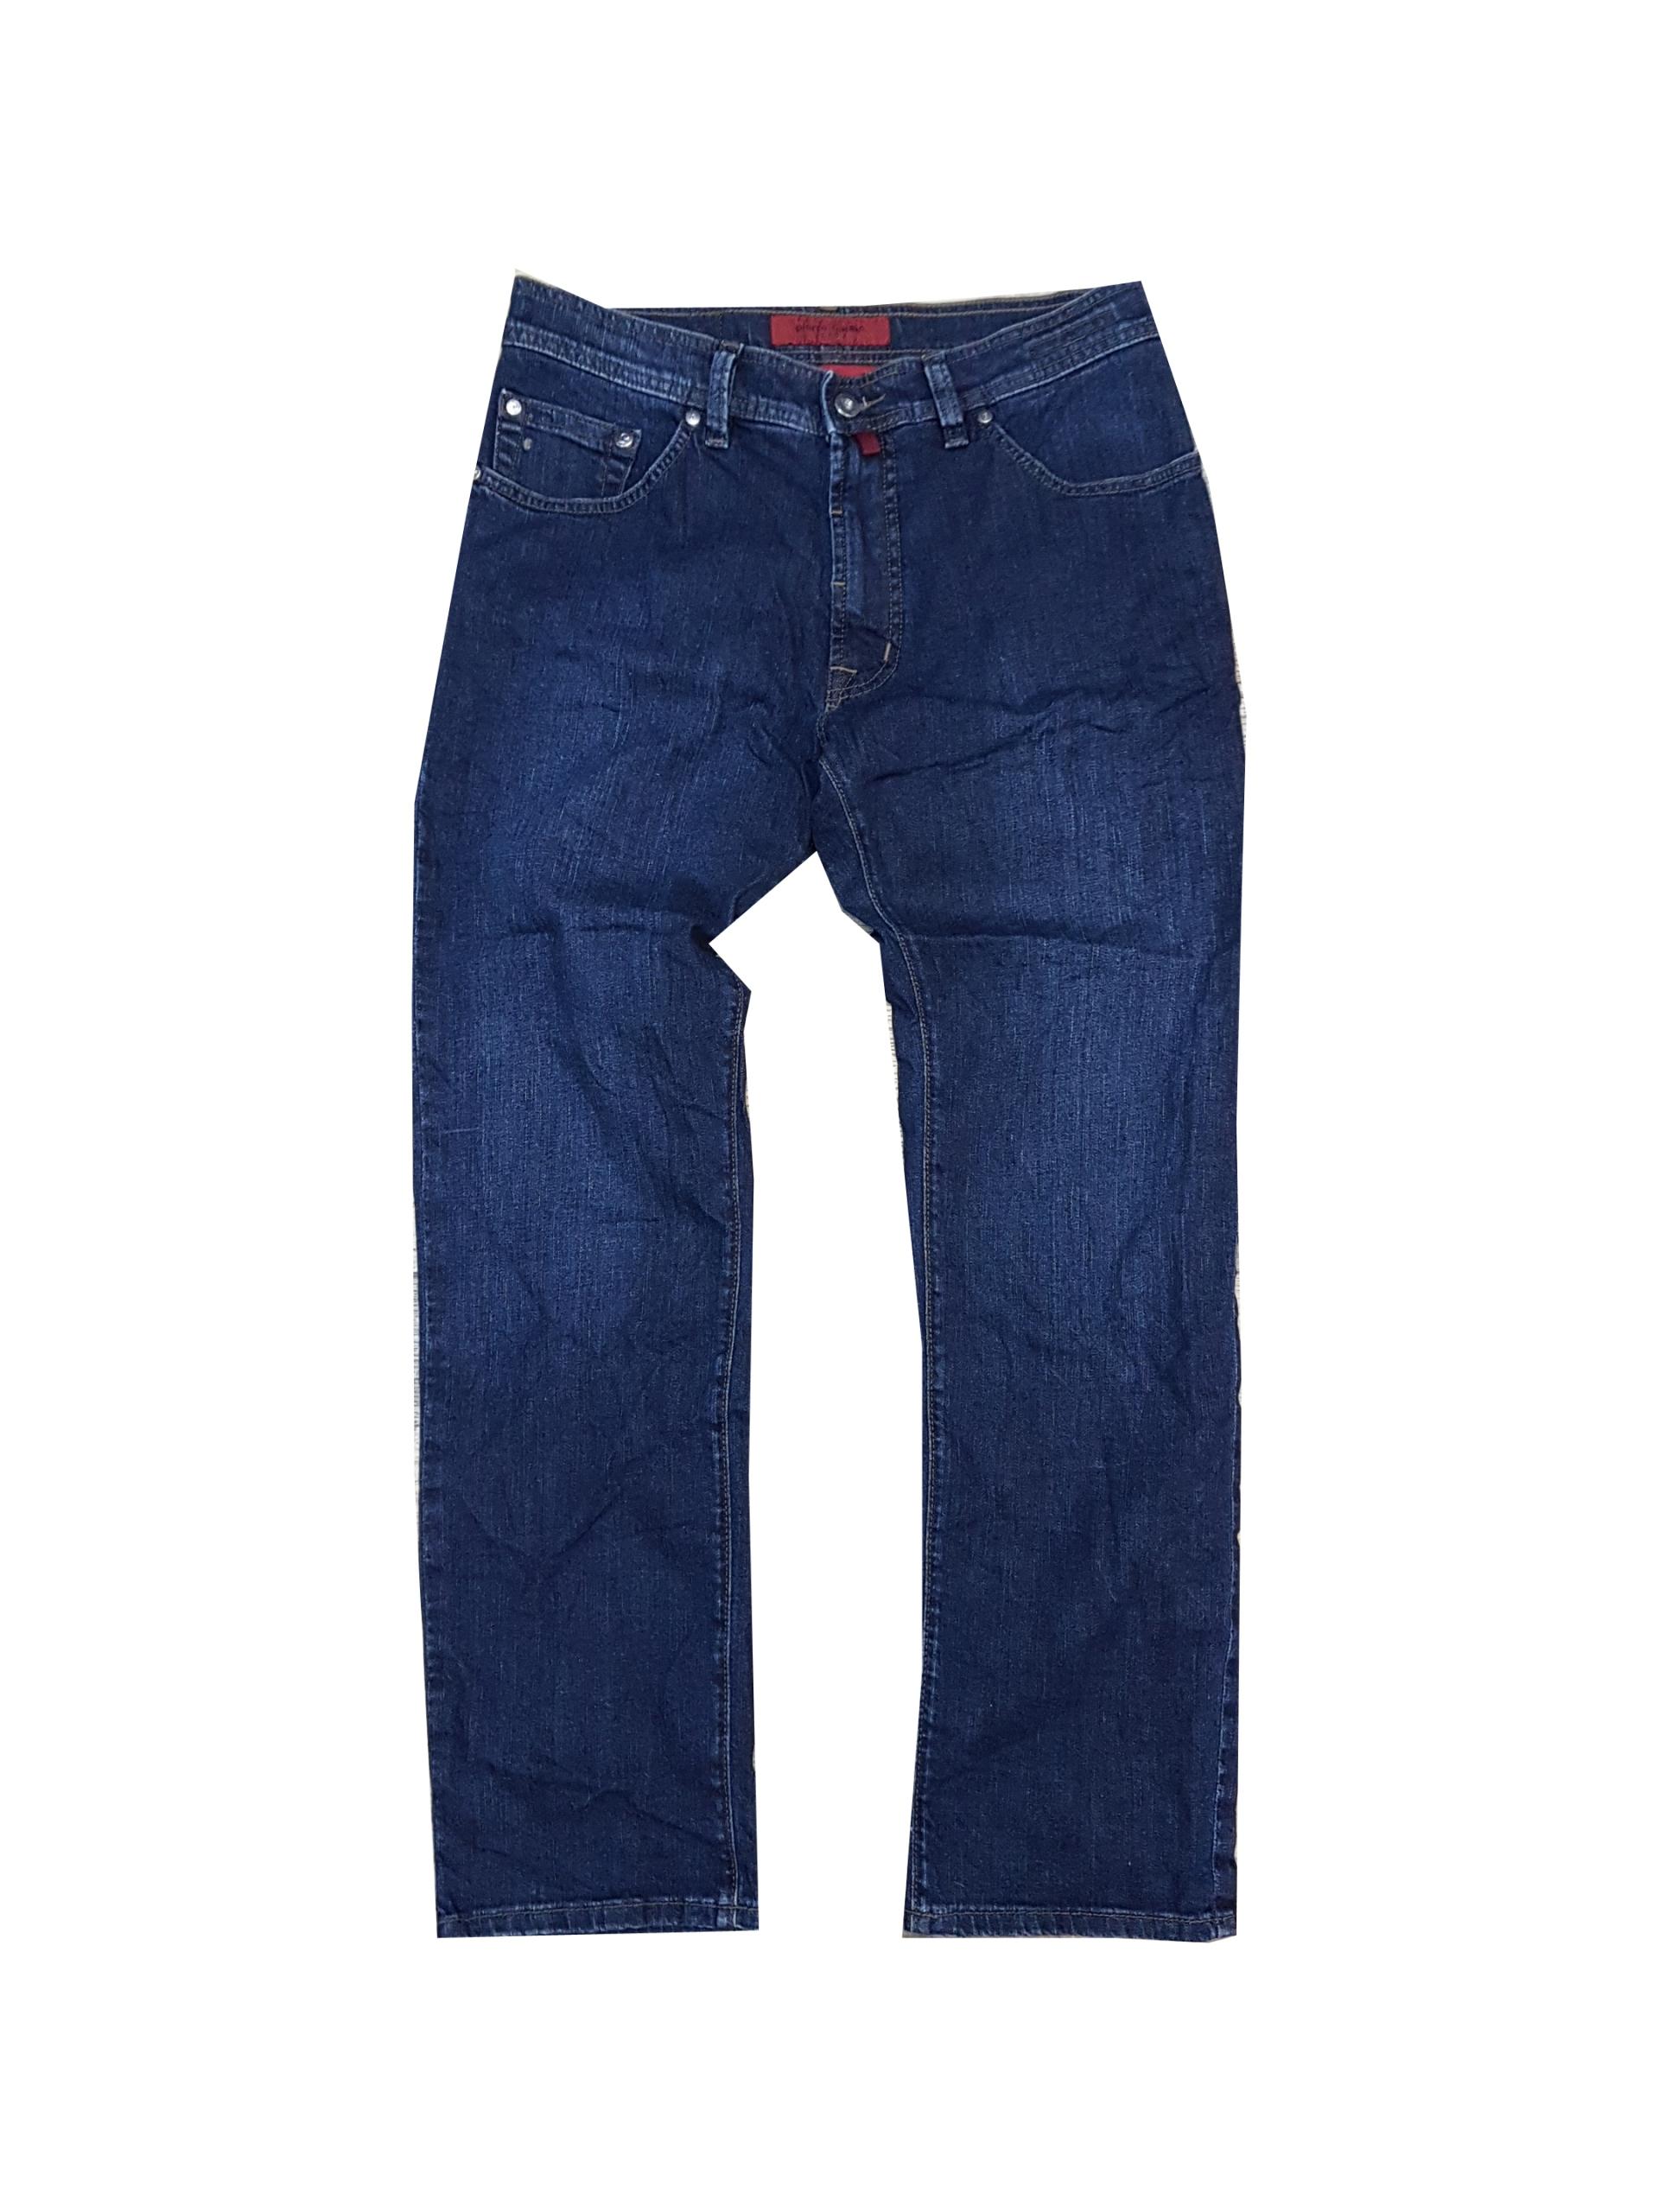 PIERRE CARDIN Deauville jeansy Stretch 33/30 85 cm